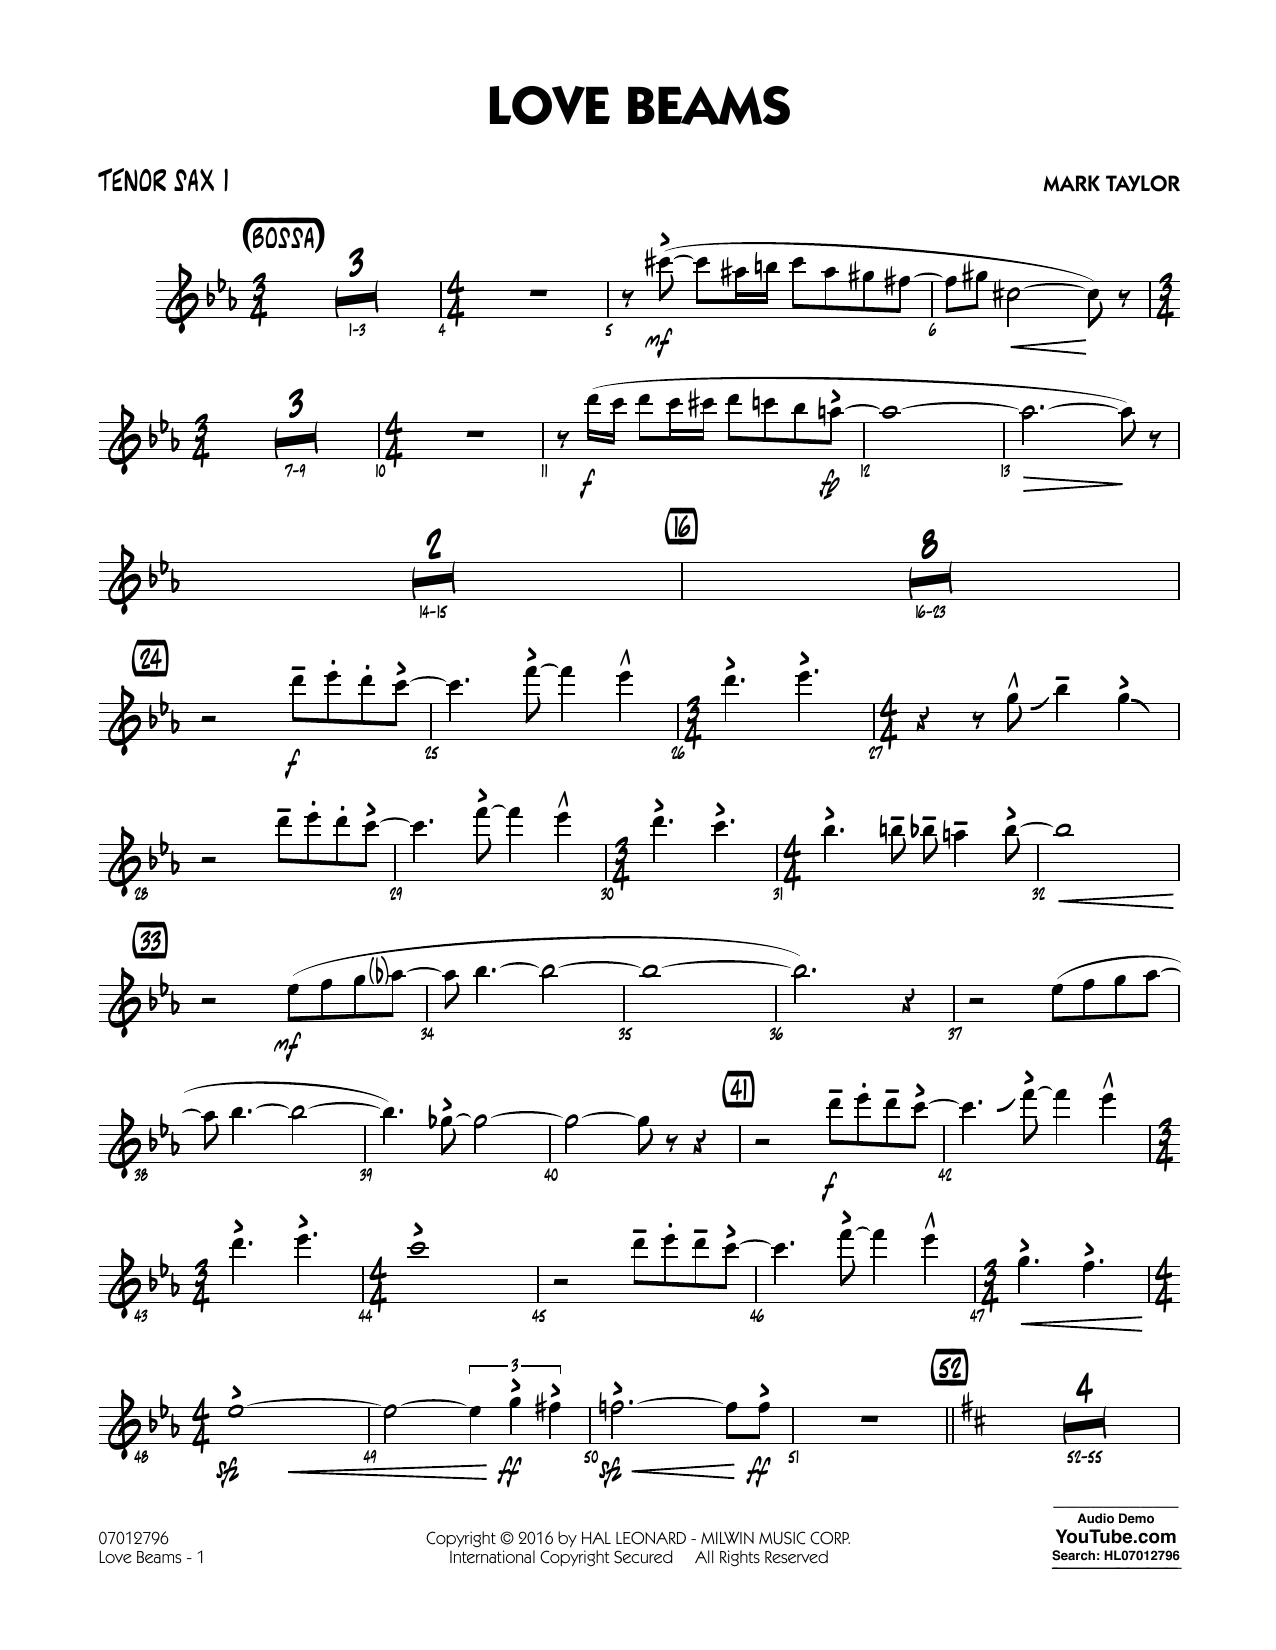 Love Beams - Tenor Sax 1 (Jazz Ensemble)